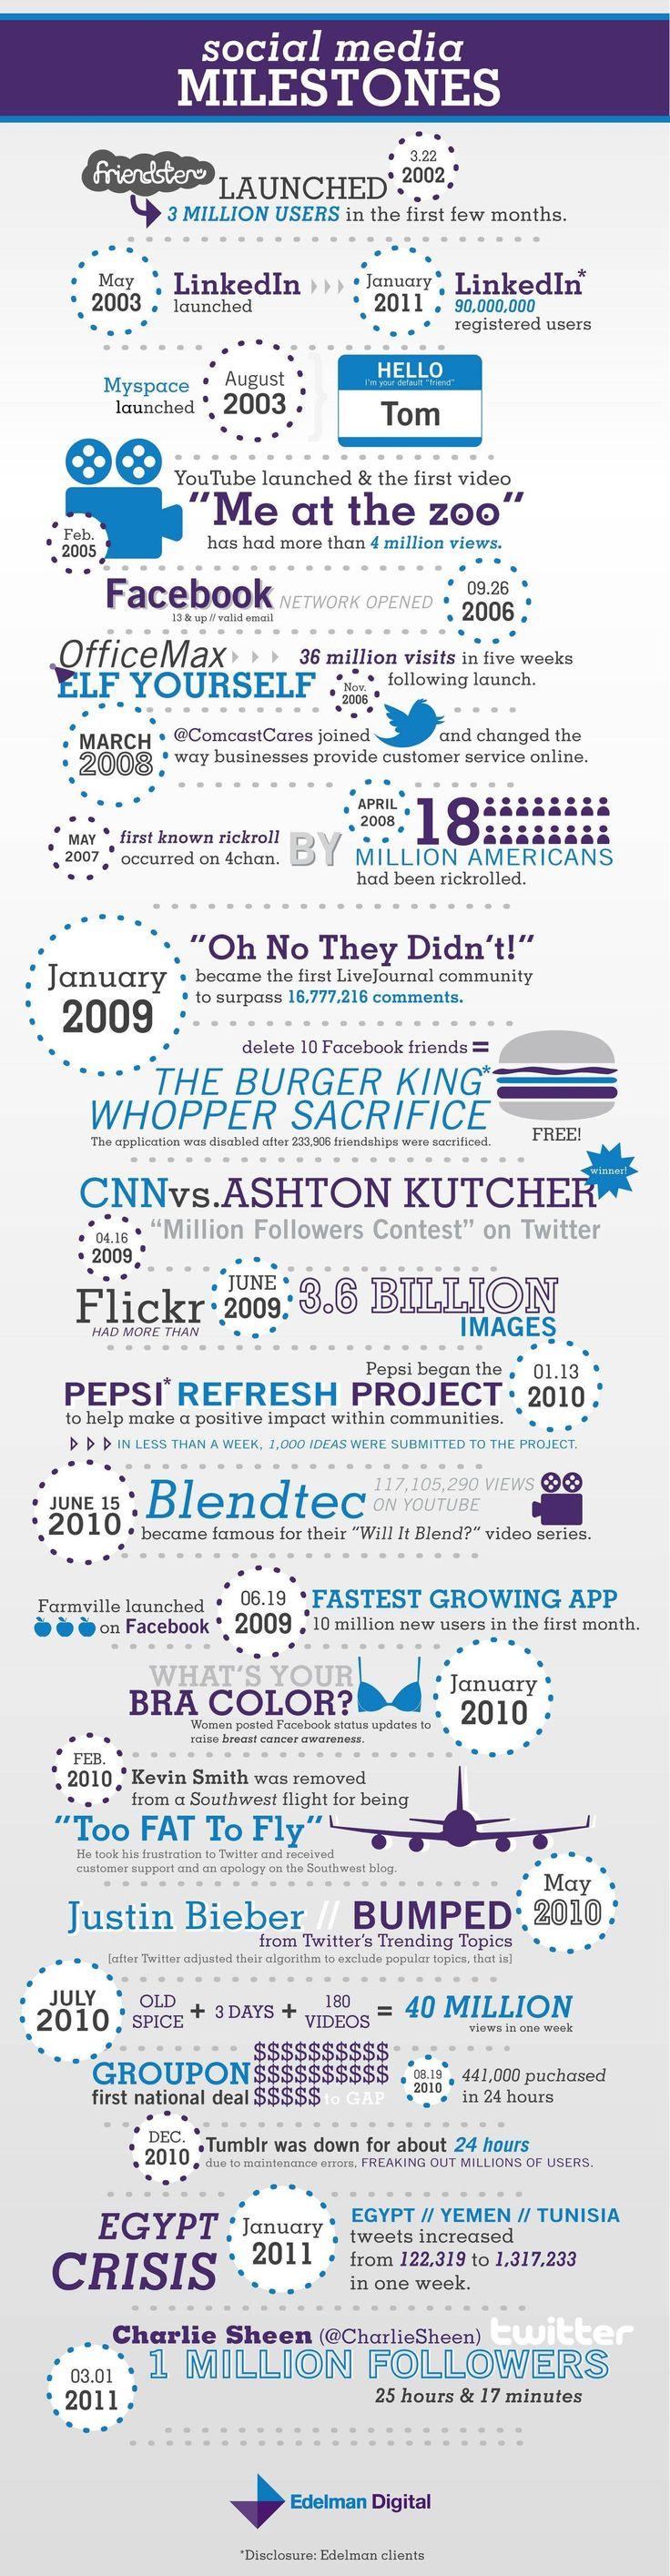 Social Media Milestones